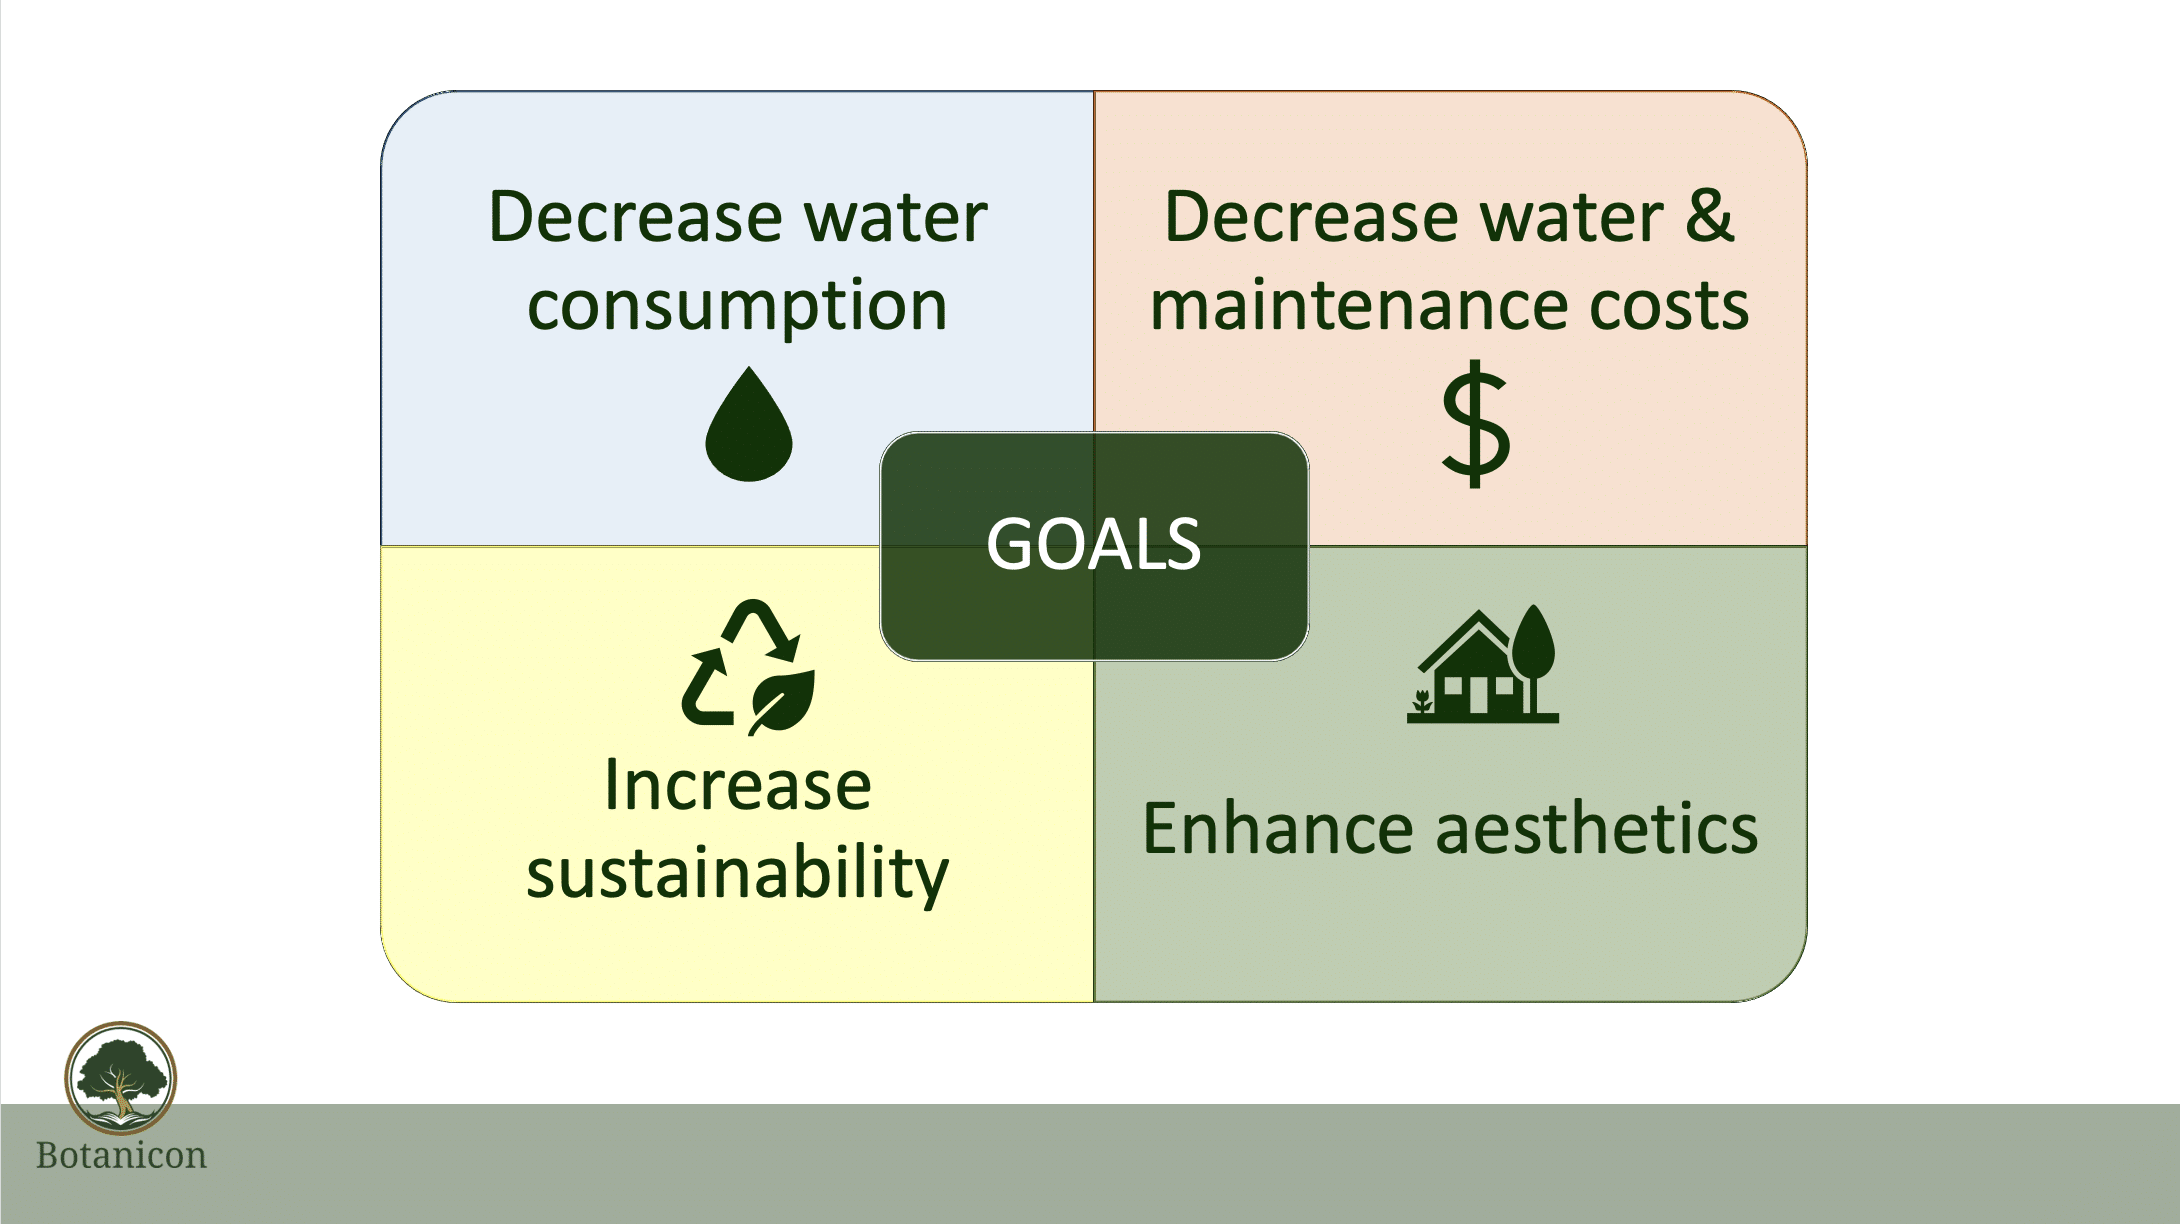 Landscaping goals, decrease water, maintenance, increase sustainability, enhance aesthetics